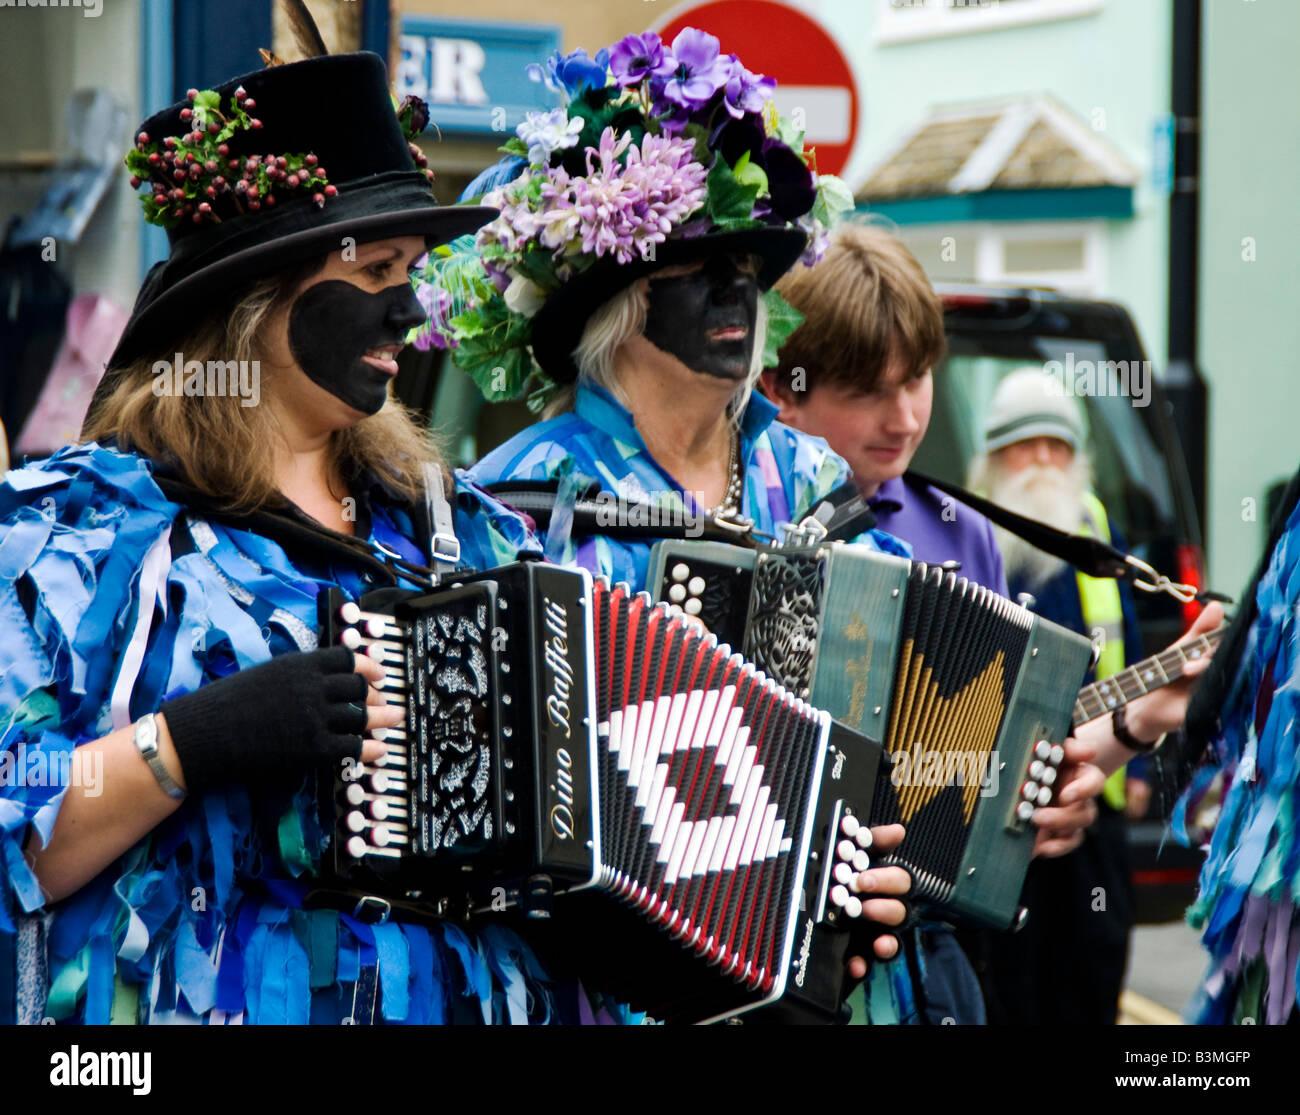 Exmoor Border Morris Men musicians playing at Shipston on Stour Proms 2008. Warwickshire, England, UK - Stock Image